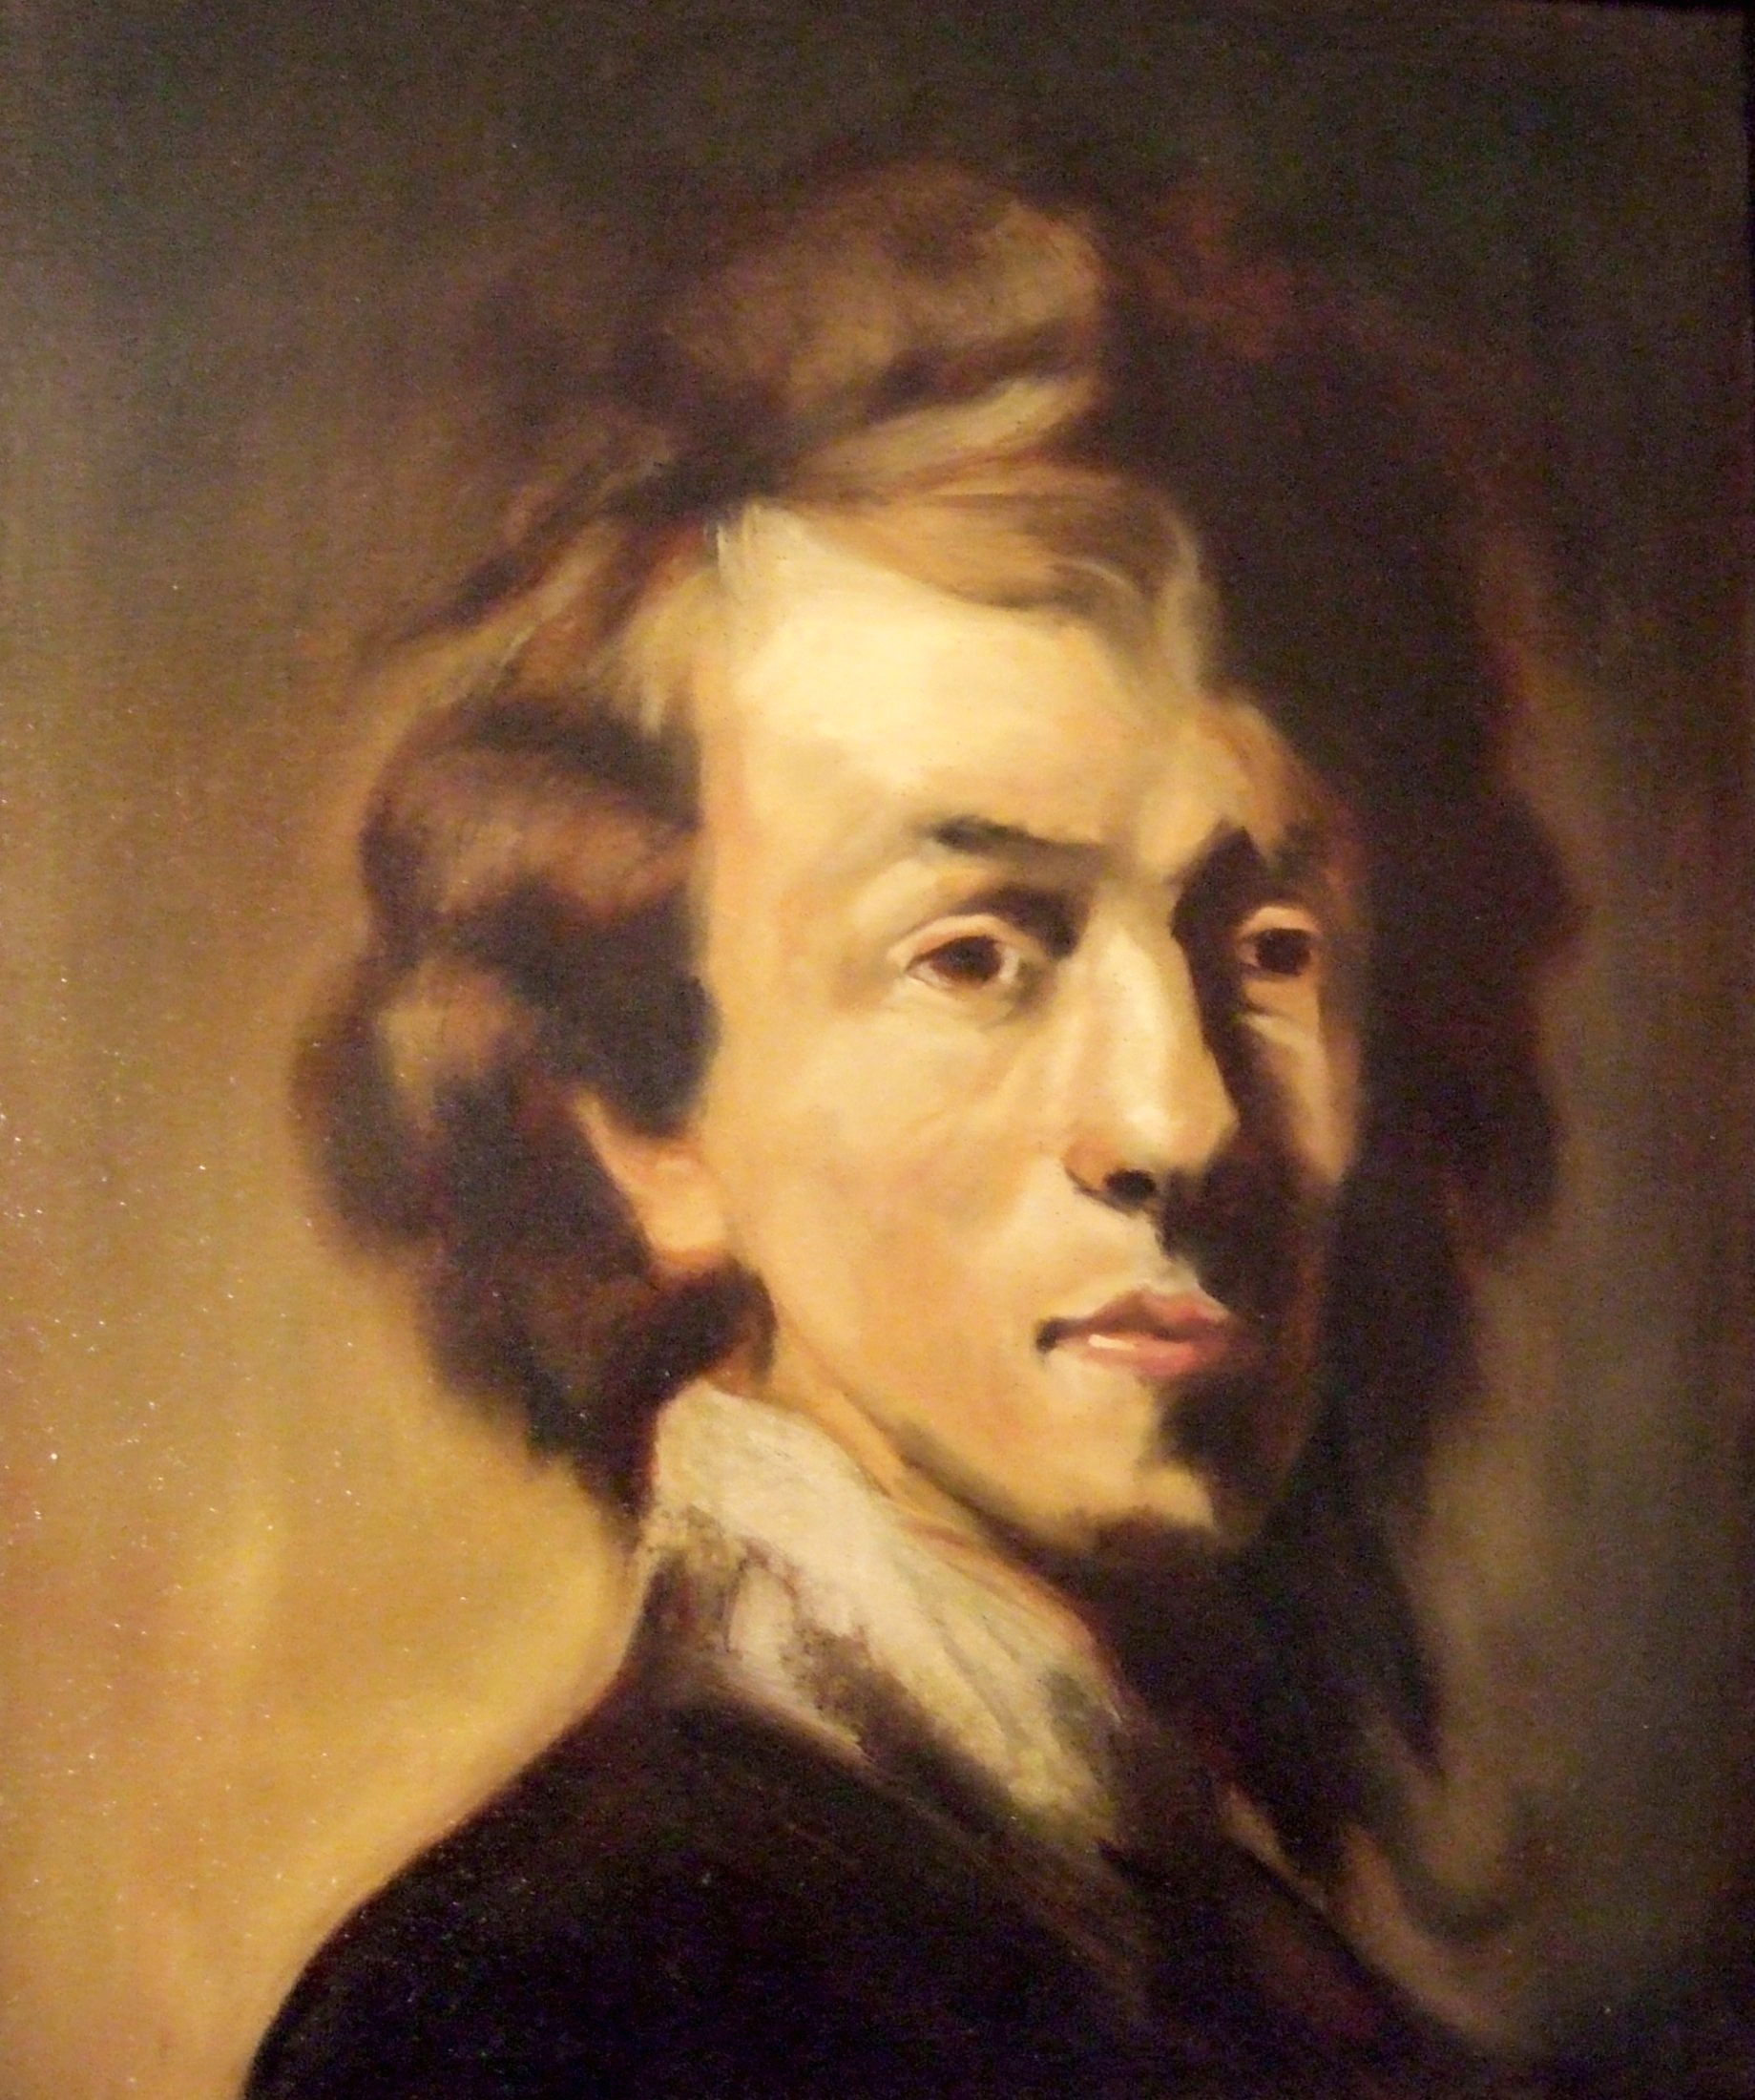 Interpretation of Rembrandt Selfportrait / Interprétation d'un autoportrait de Rembrandt